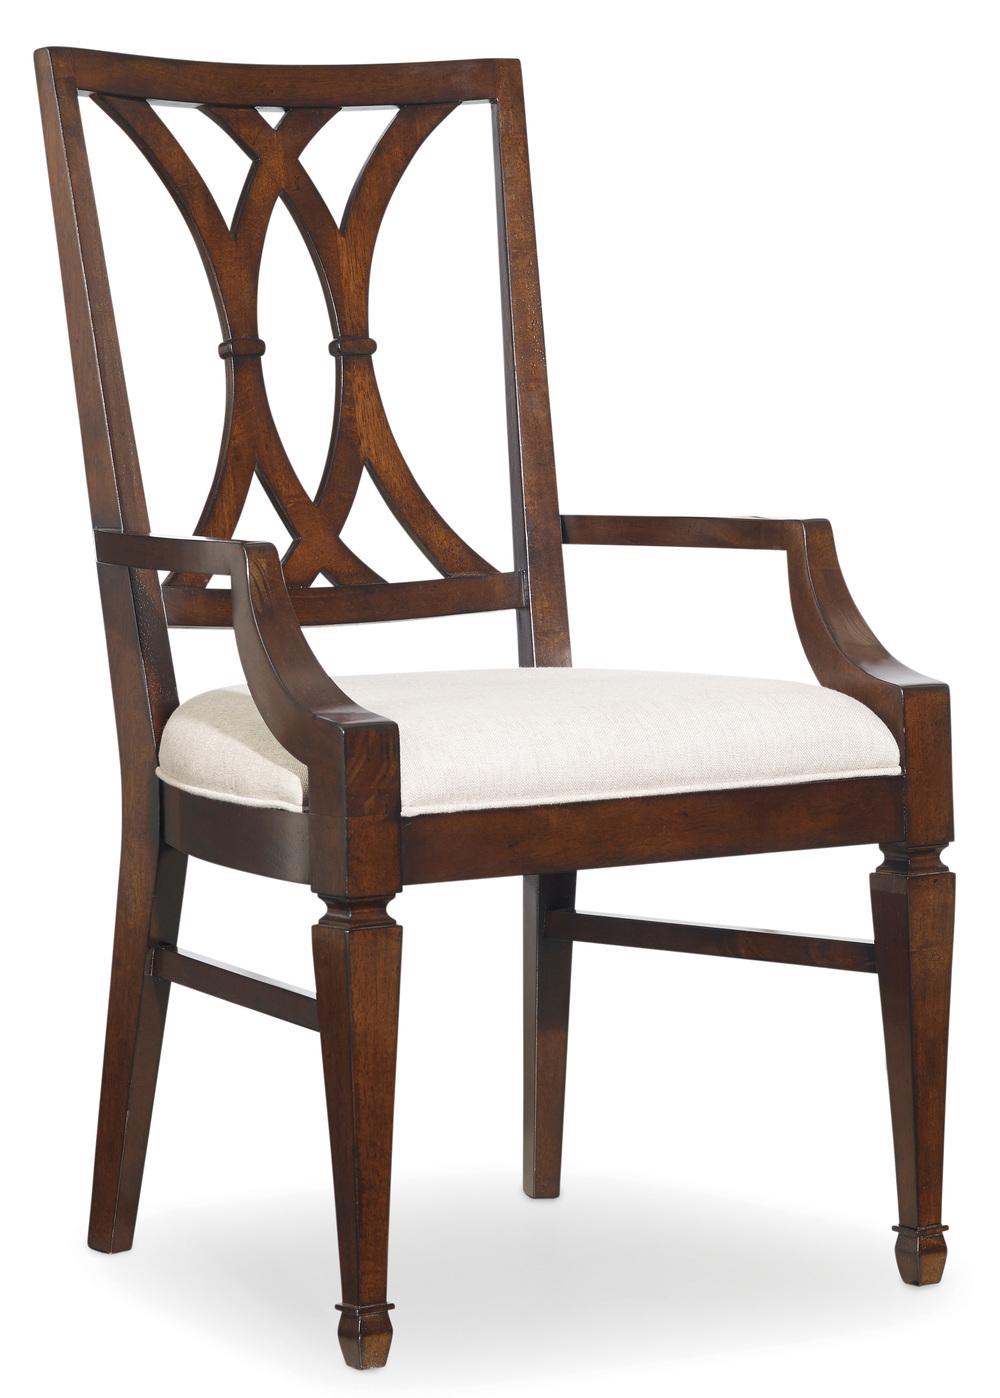 Hooker Furniture - Palisade Splat Back Arm Chair